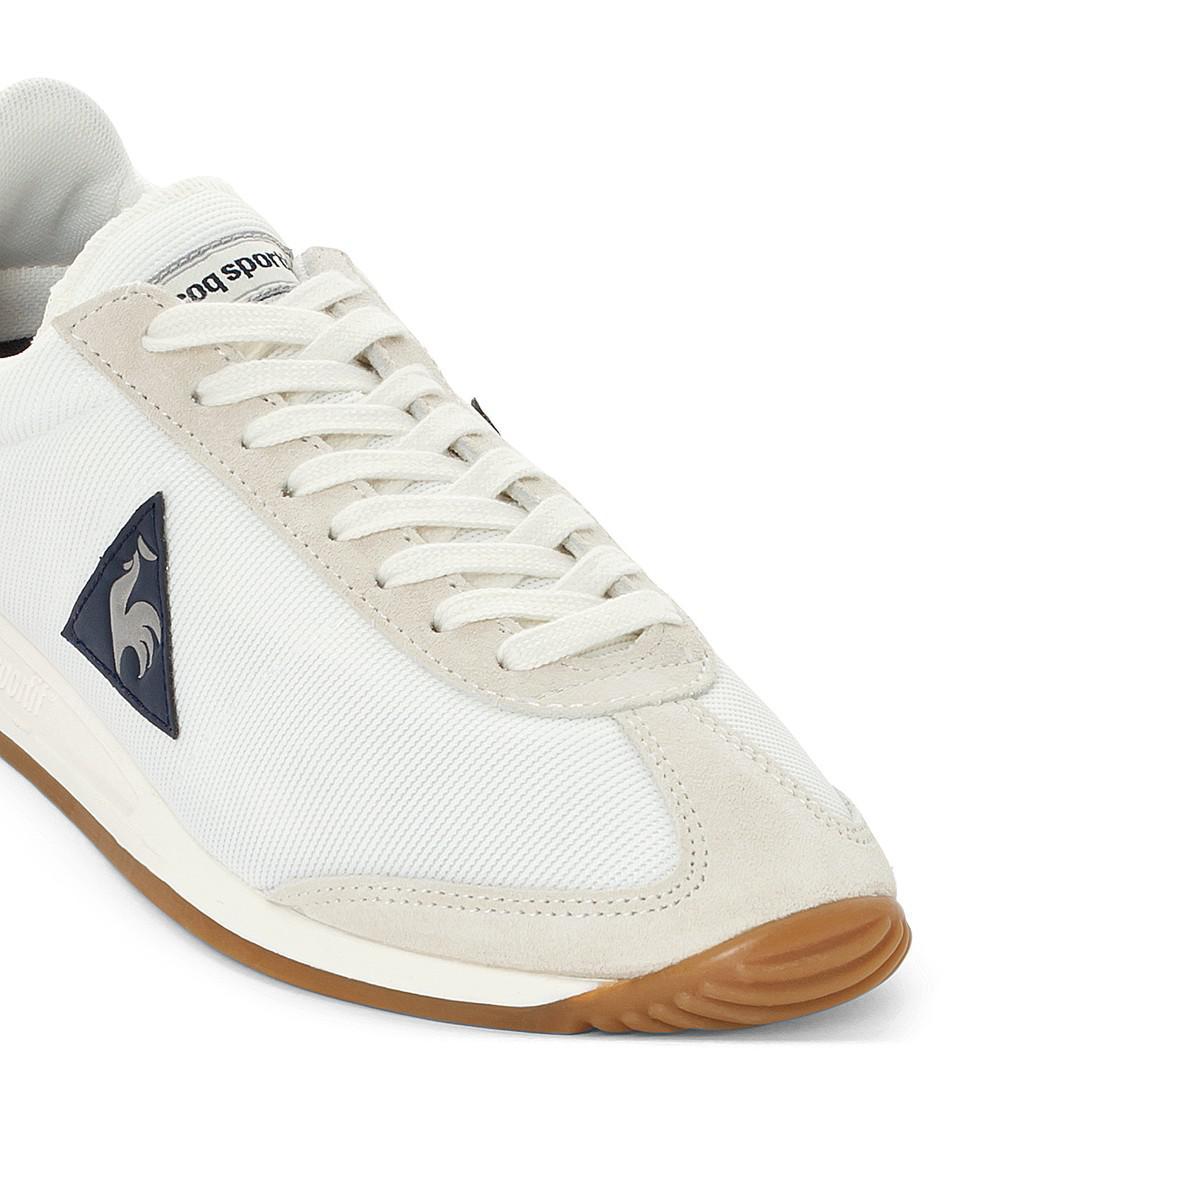 5c0b5c06cffc ... germany le coq sportif white quartz nylon gum trainers for men lyst.  view fullscreen 915eb